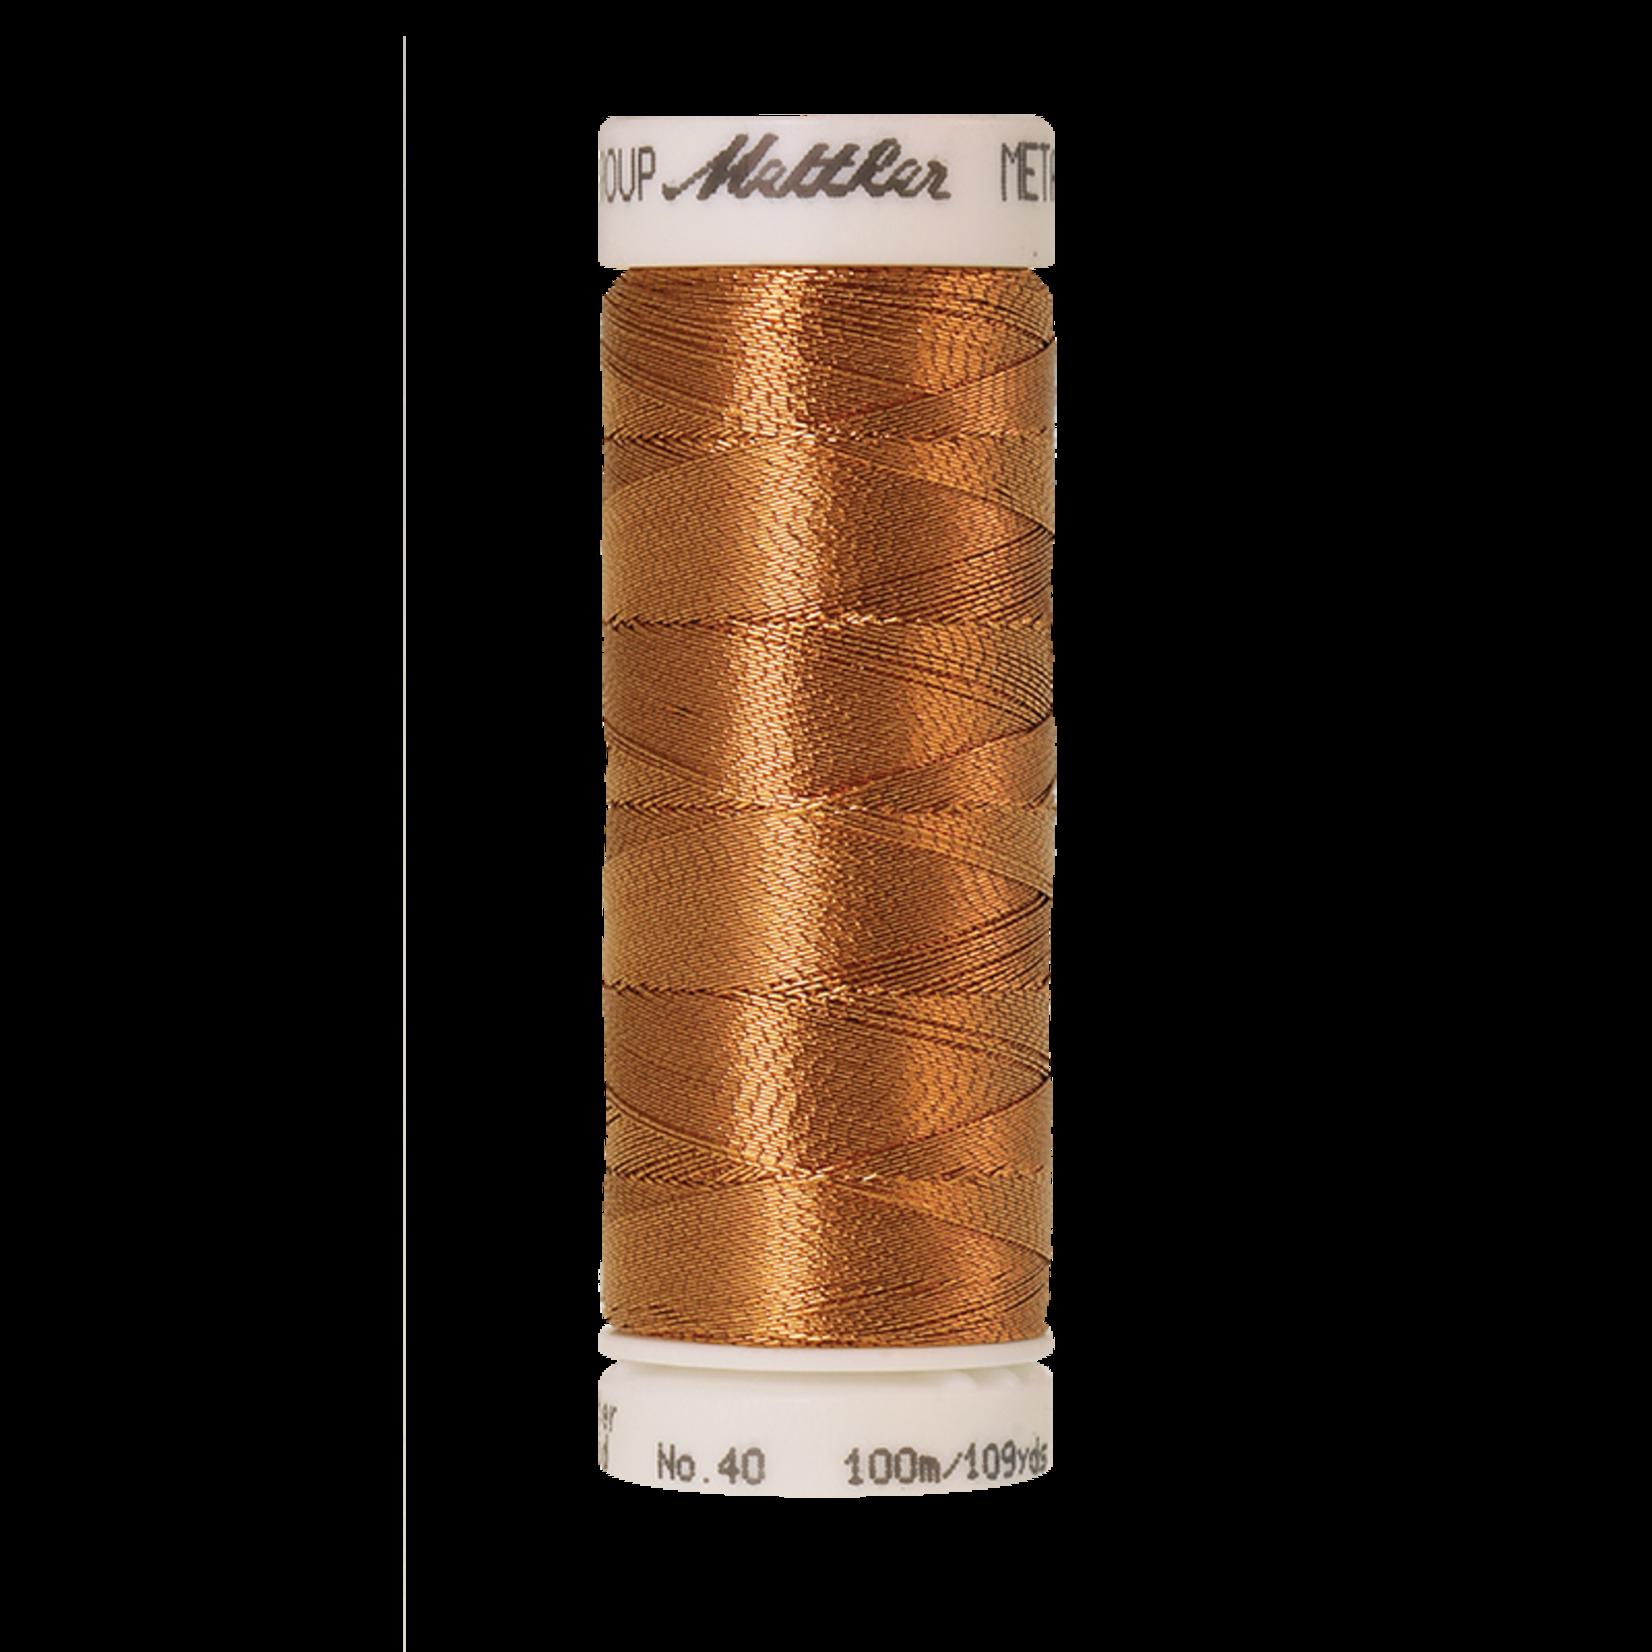 Amann Mettler Metallic - #40 - 100 m - 1134z Copper Gold